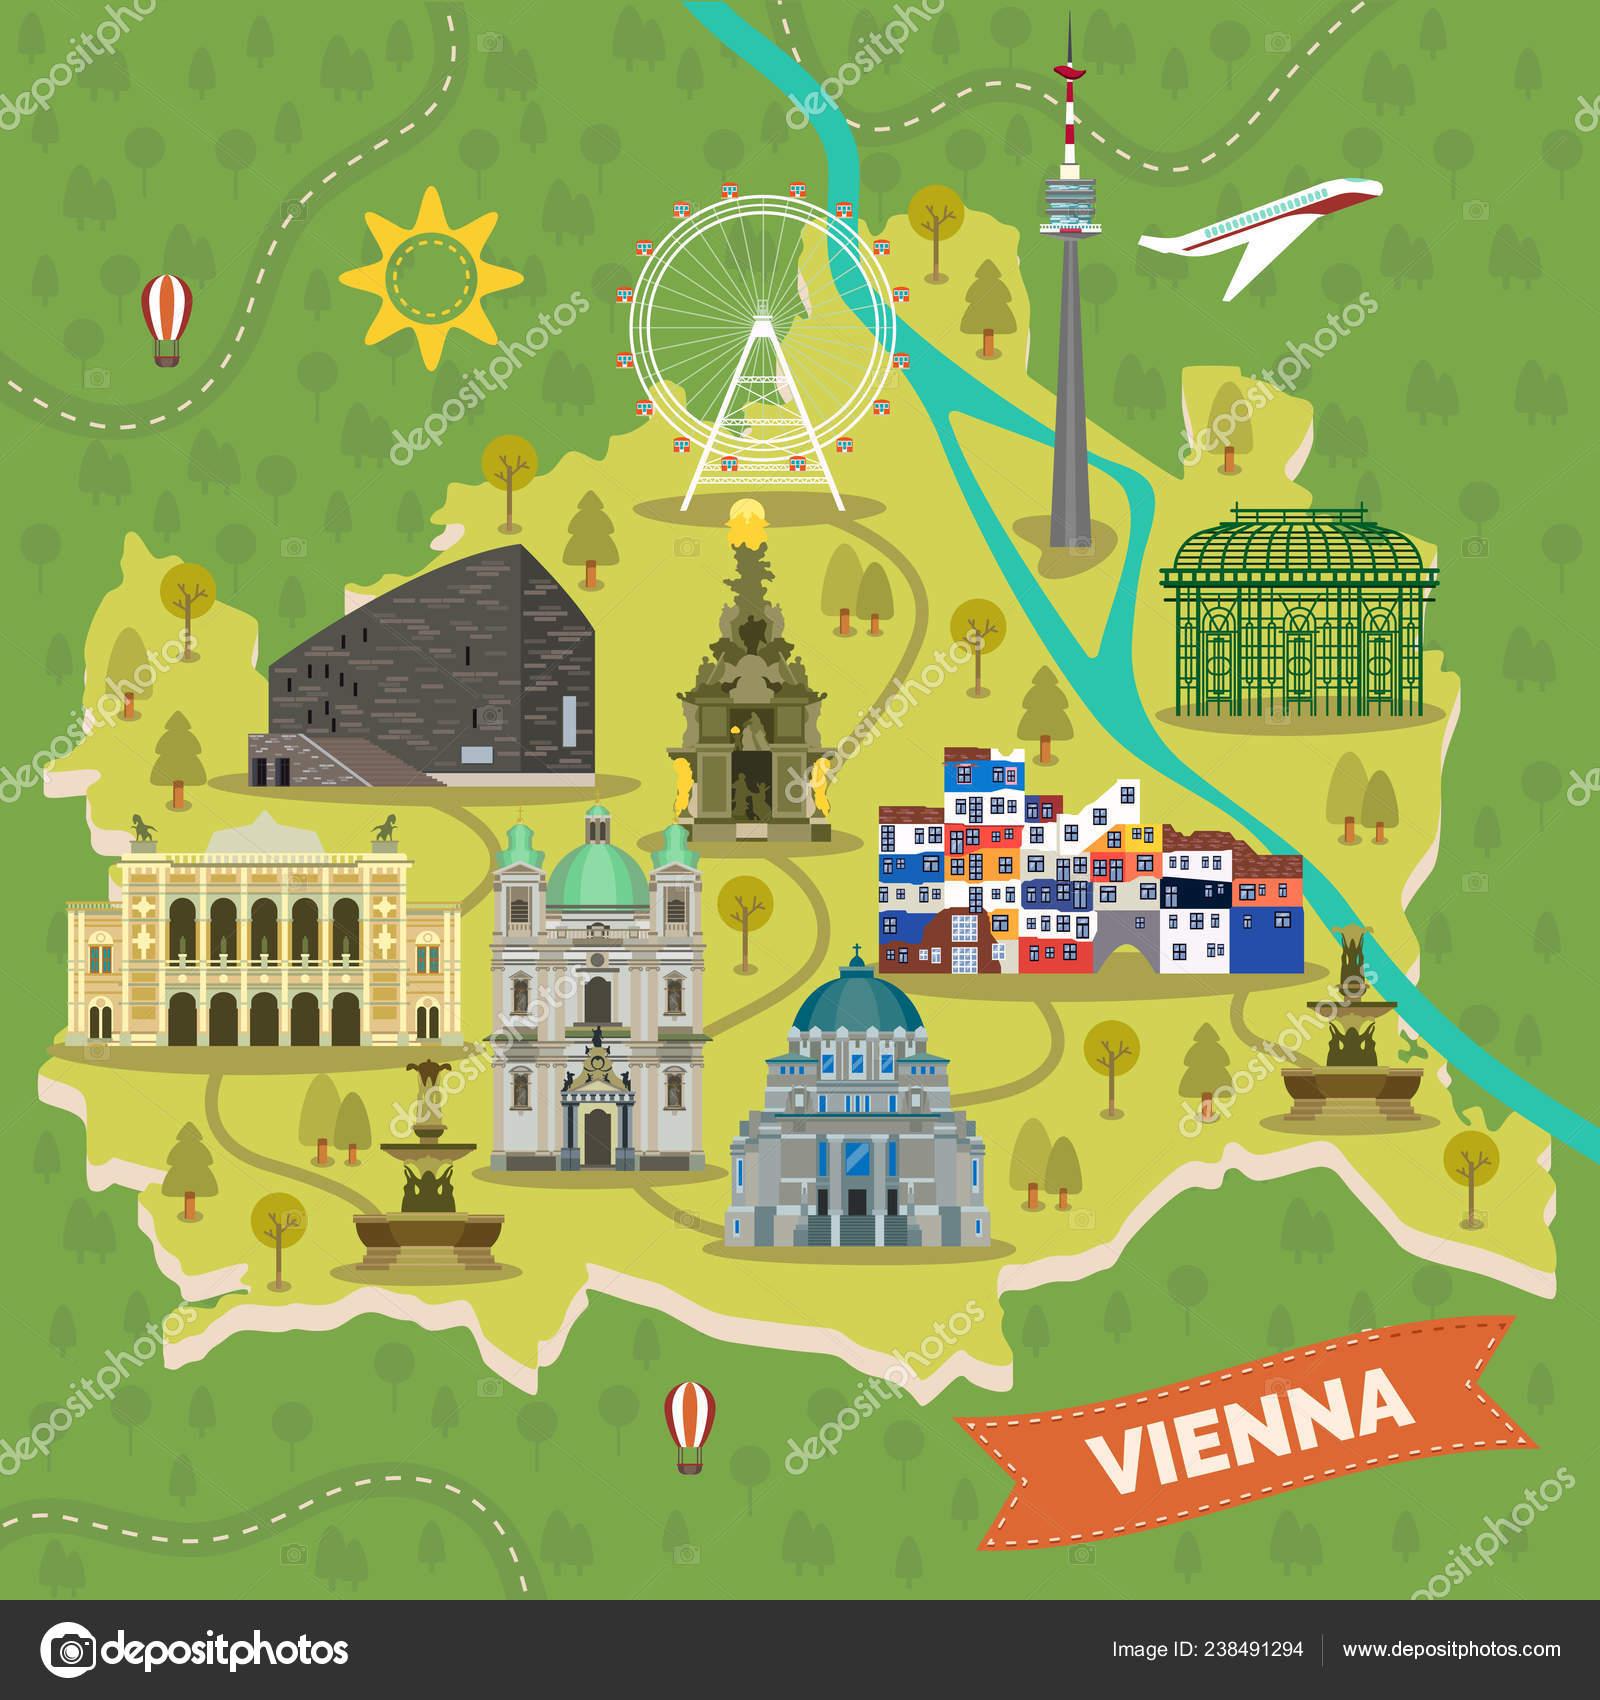 Austria Cartina Turistica.Mappa Turistica Di Vienna In Austria Con Luoghi D Interesse